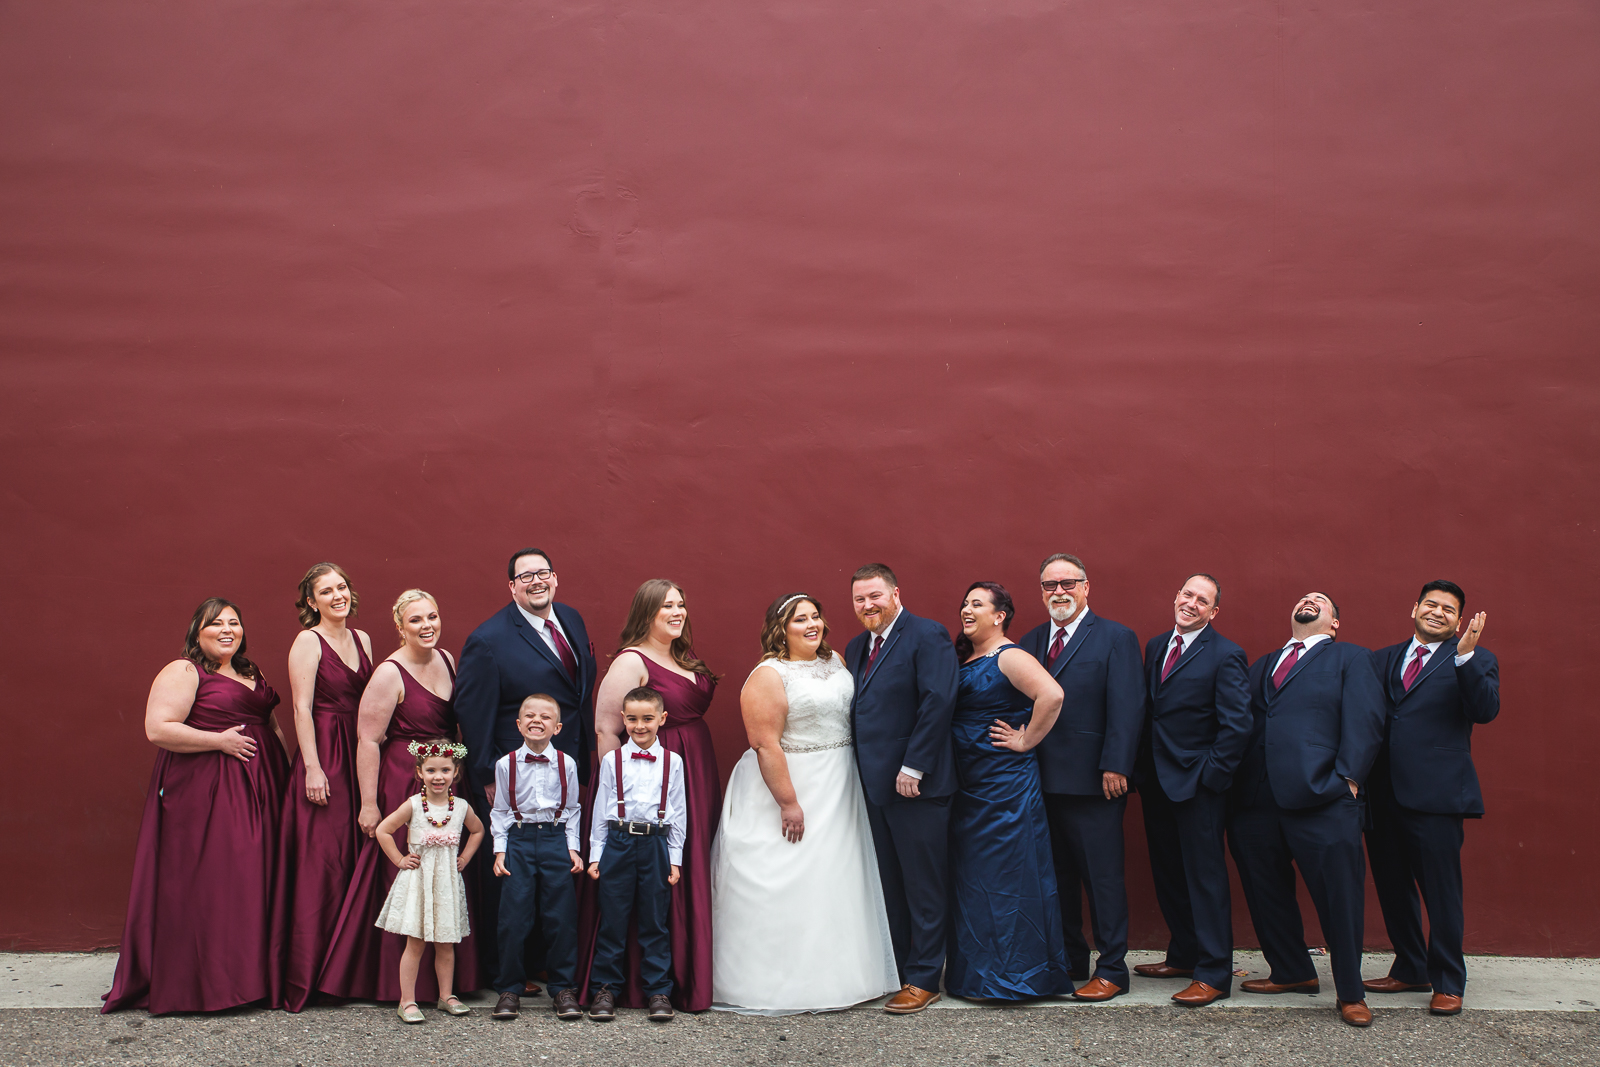 mural wedding photo modesto.jpg